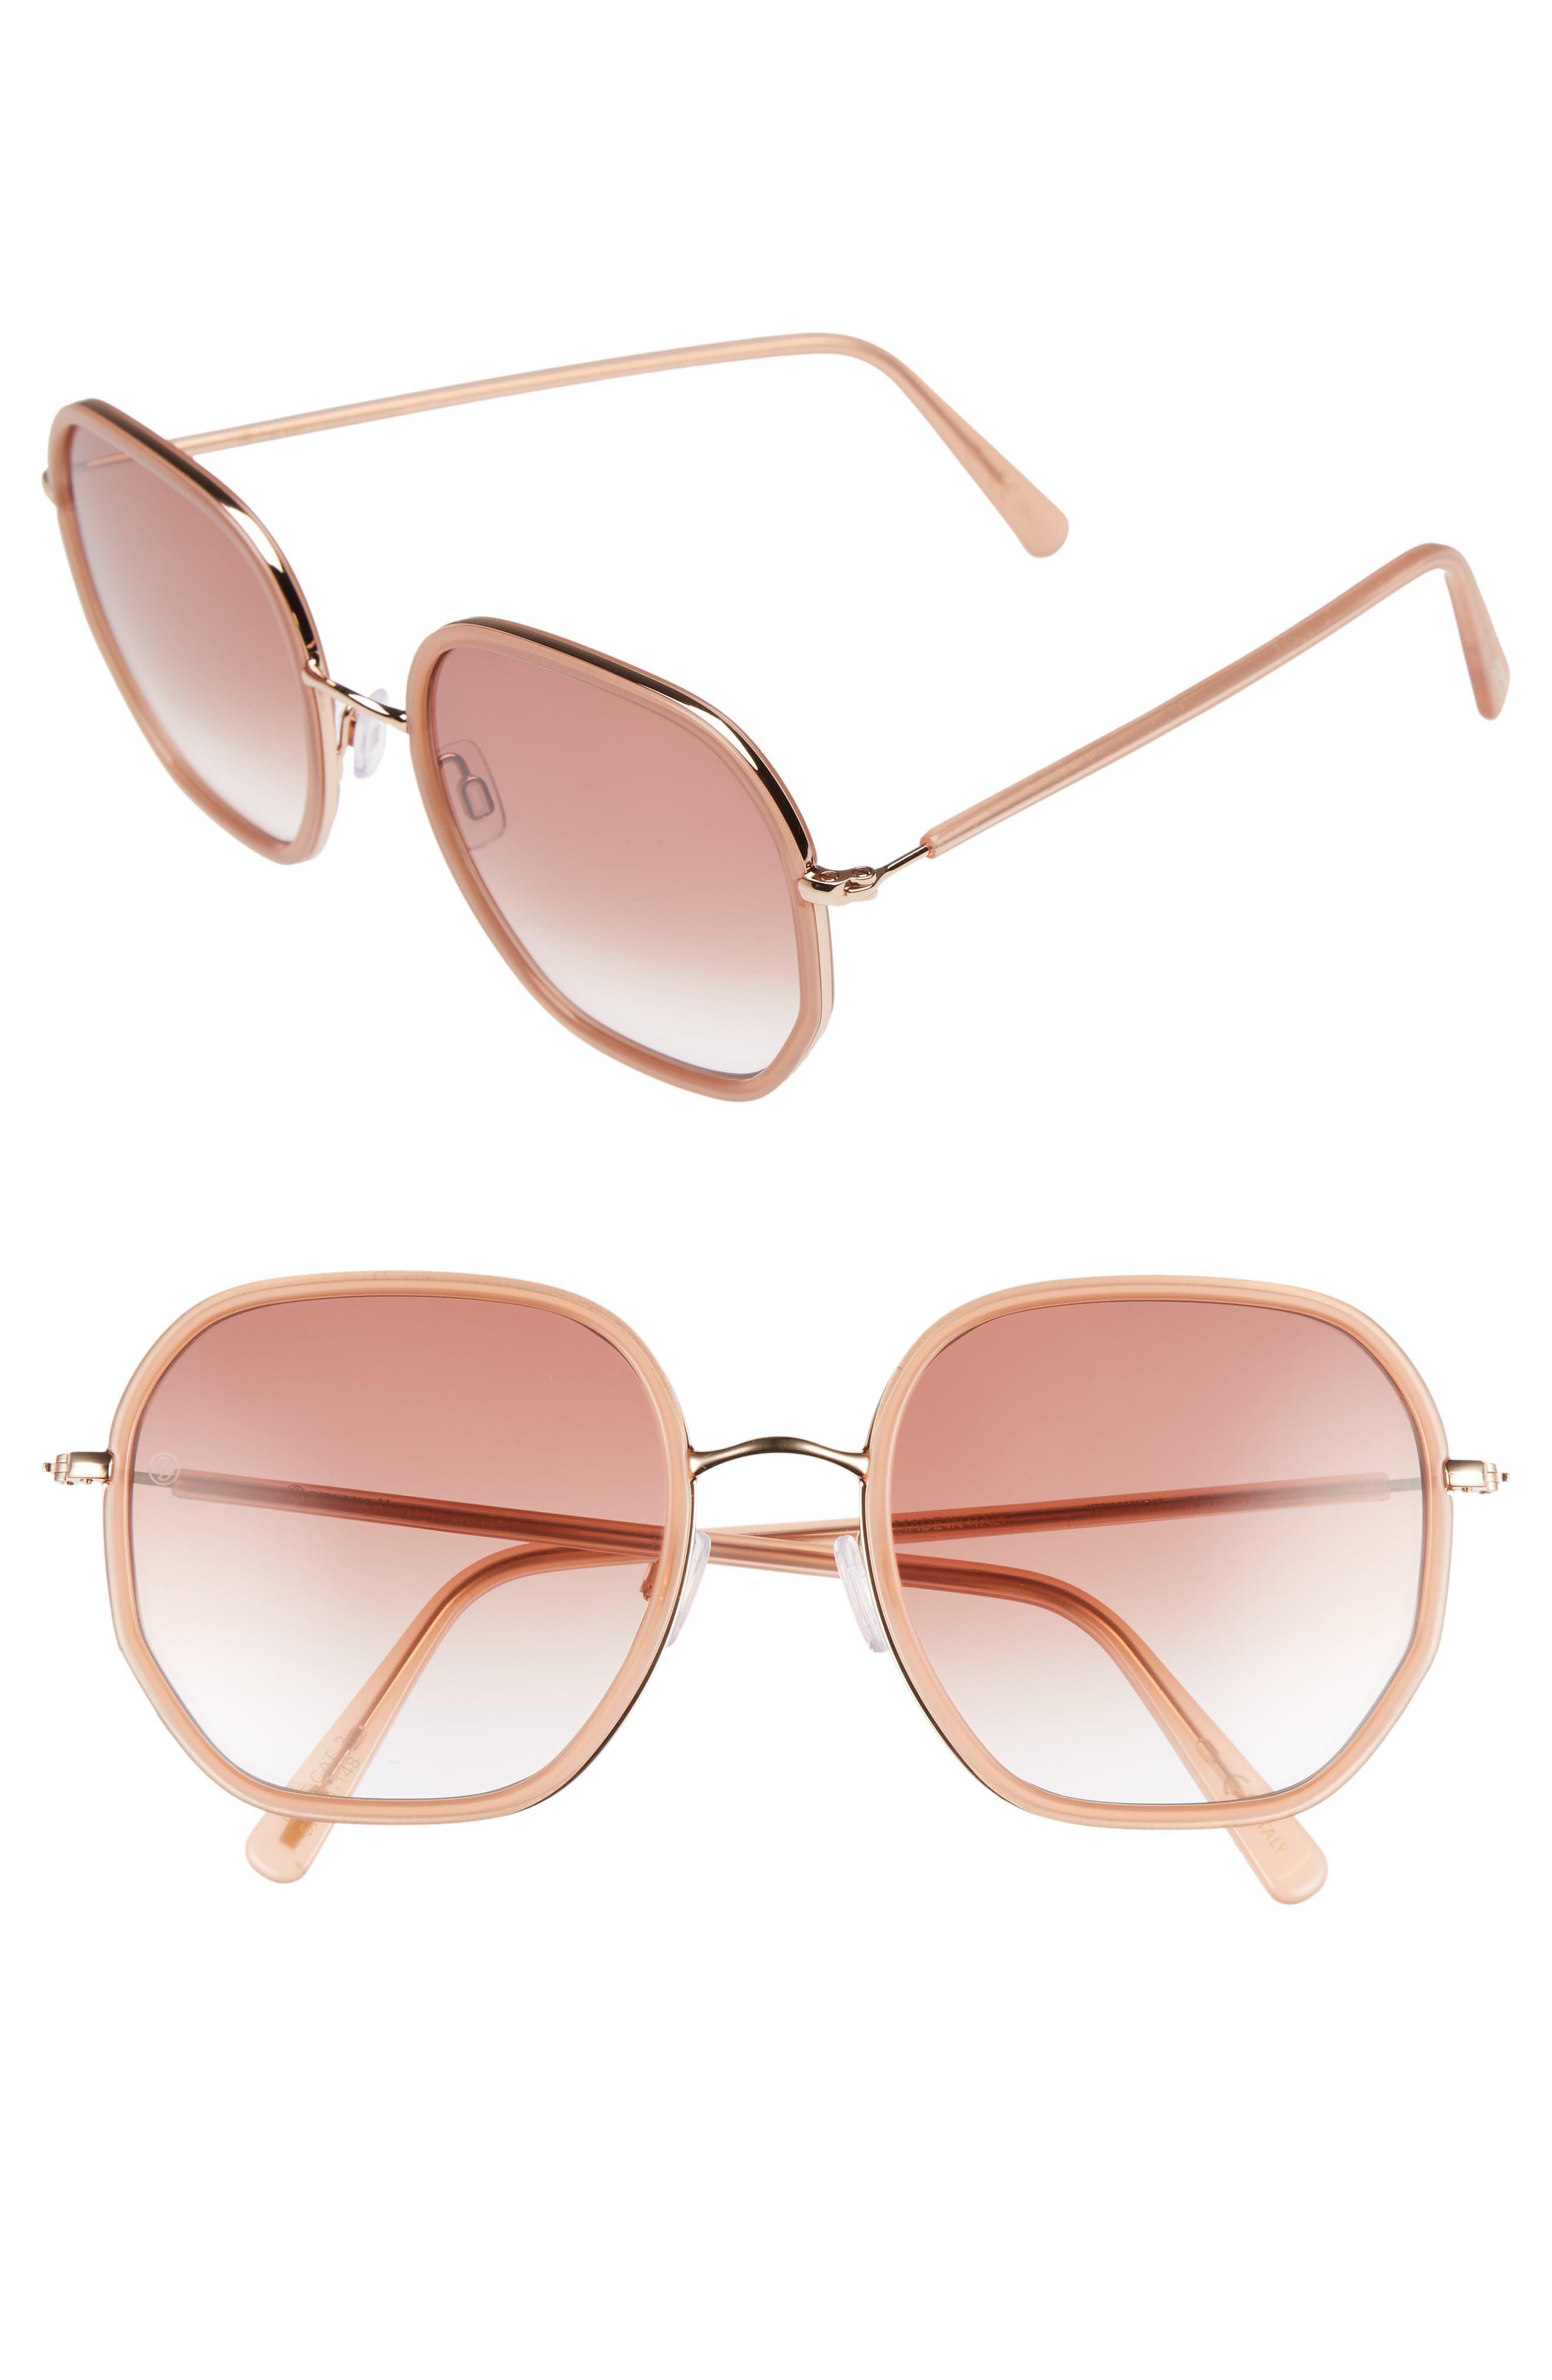 D'BLANC Rare Fortune 57mm Sunglasses,                         Main,                         color, 650